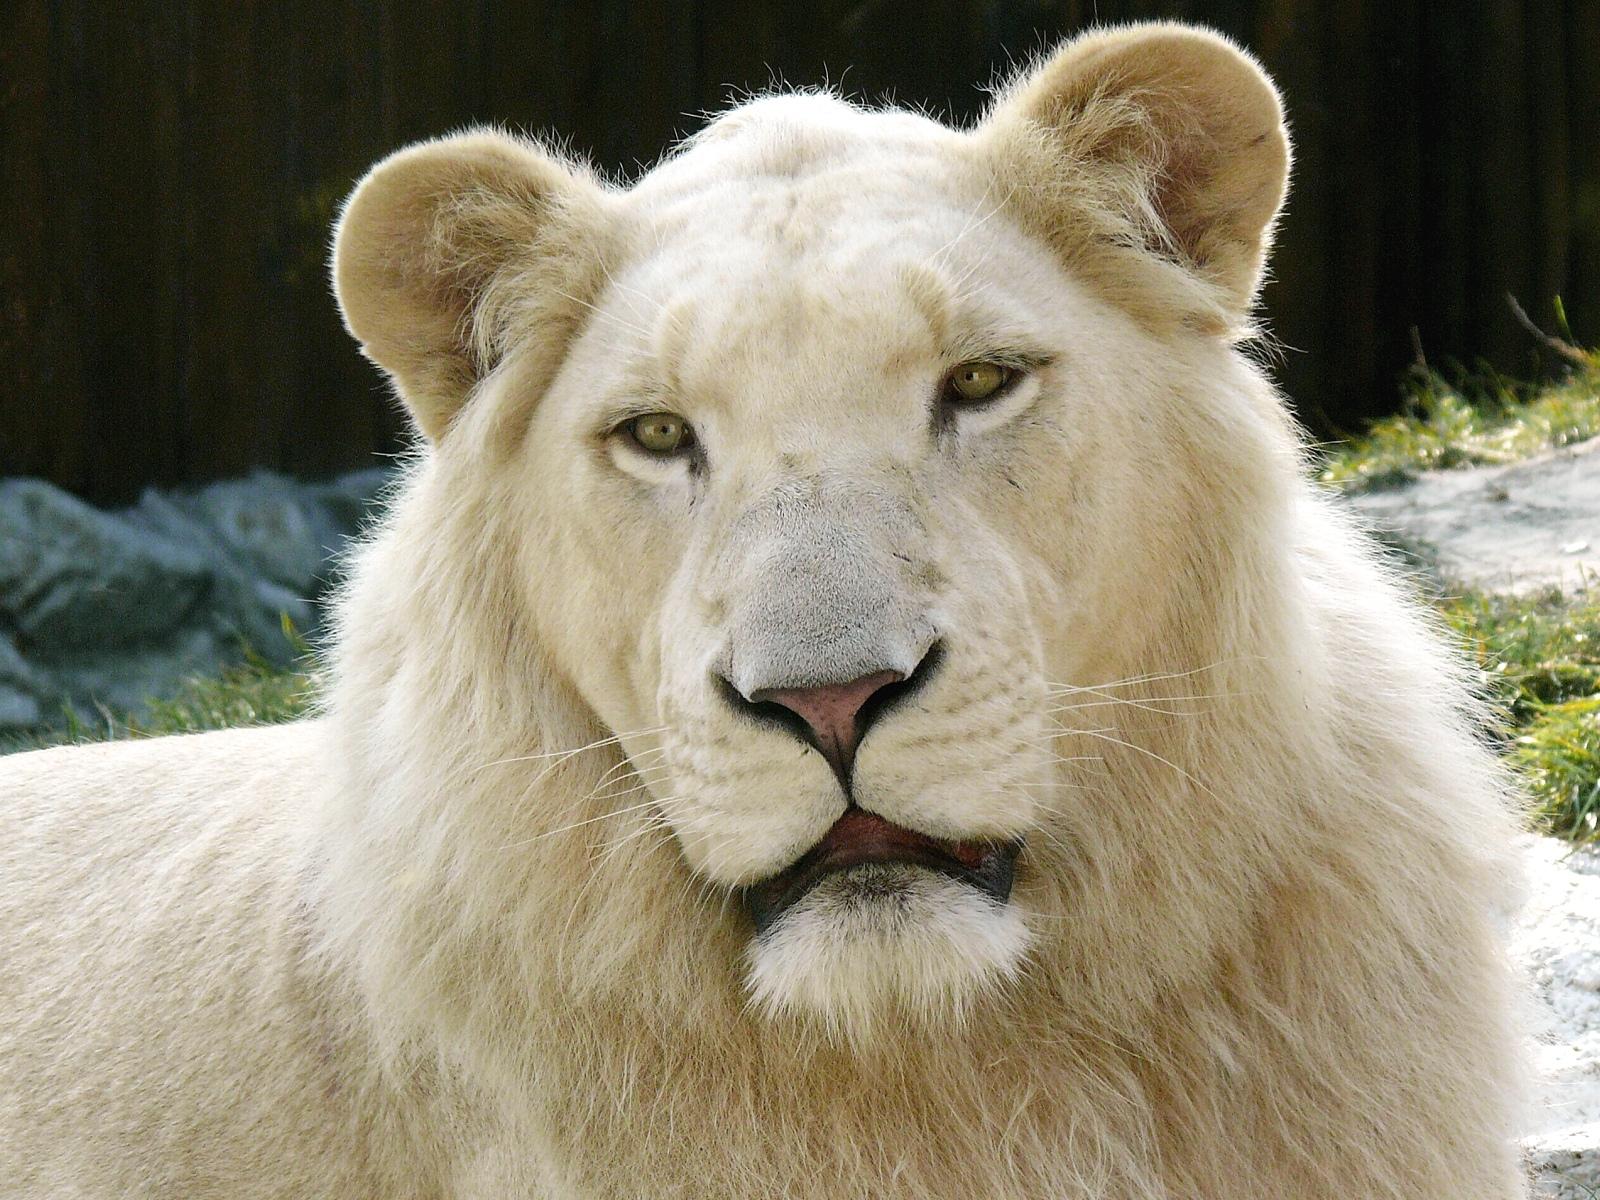 Singa Putih Raja Hutan Yang Langka Gosip Gambar